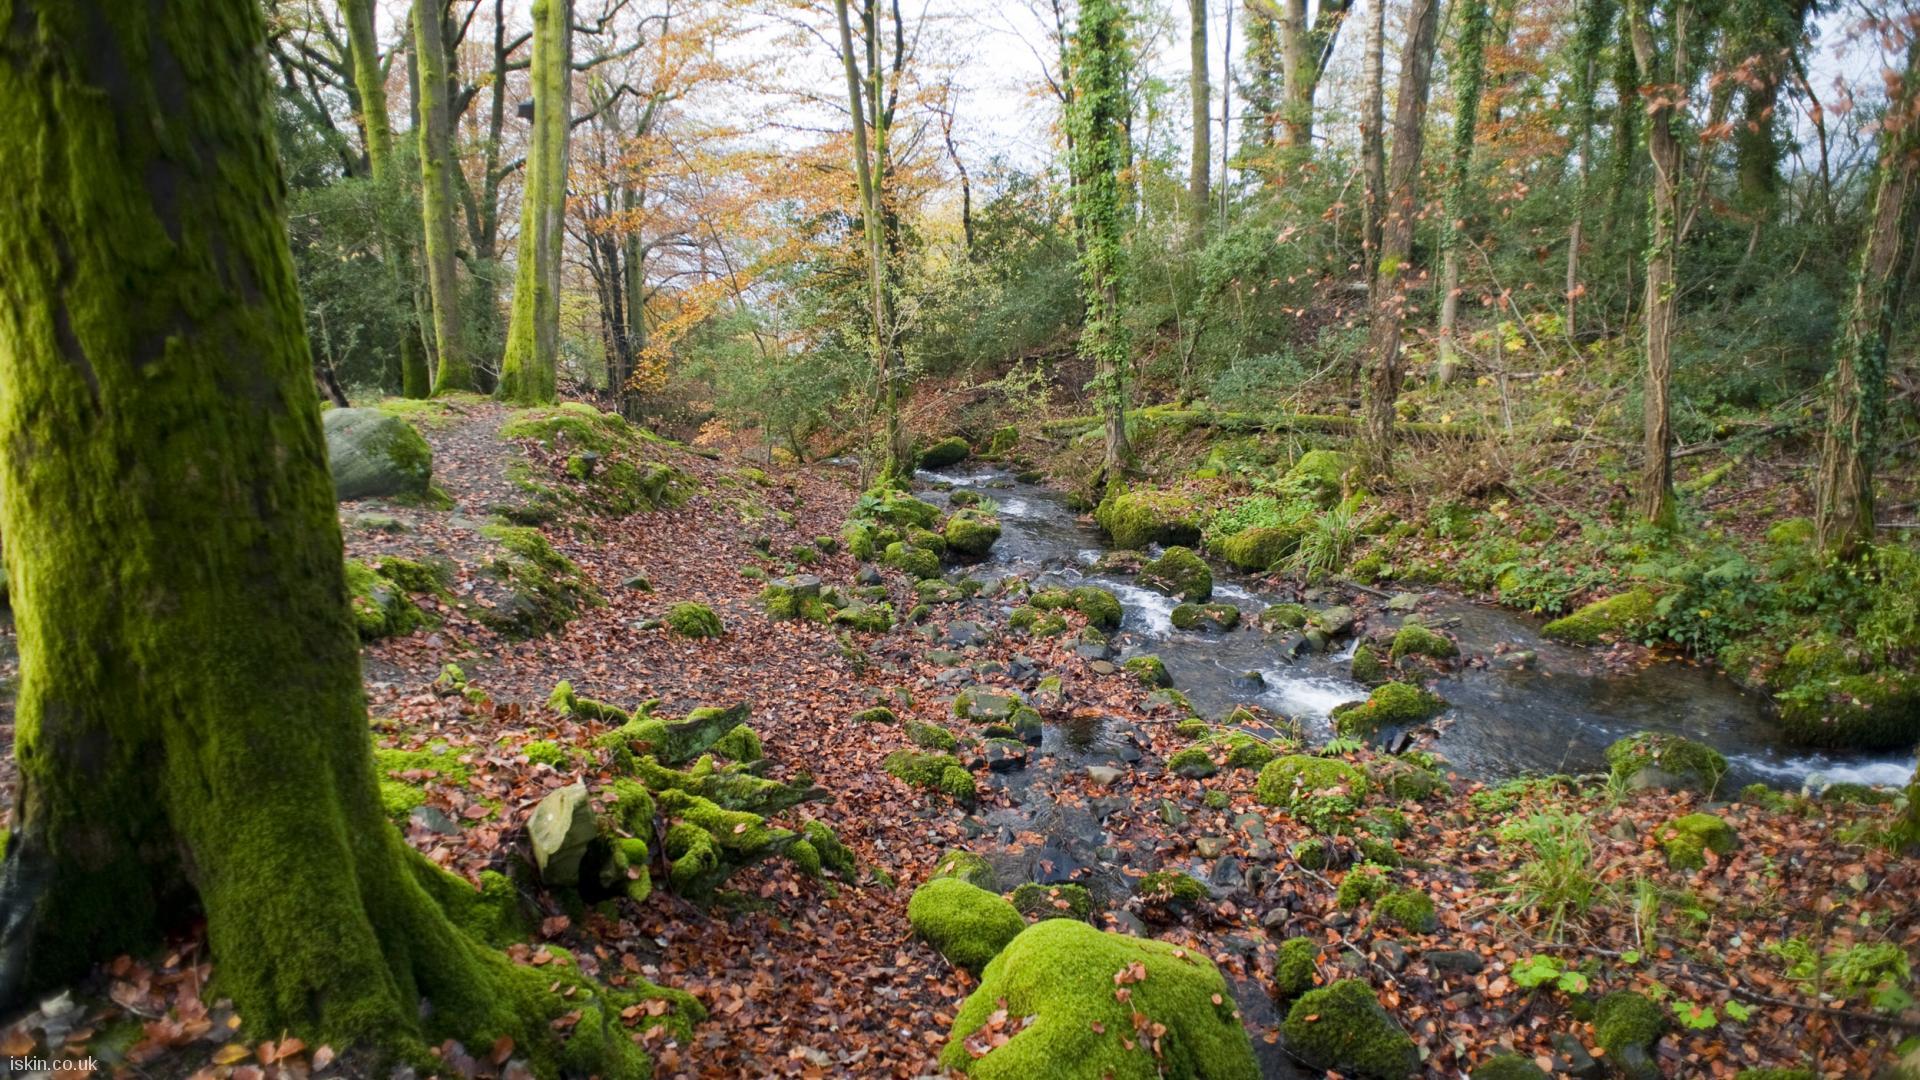 Free Fall Wallpaper For Ipad Autumn Woodland Stream Desktop Wallpaper Iskin Co Uk